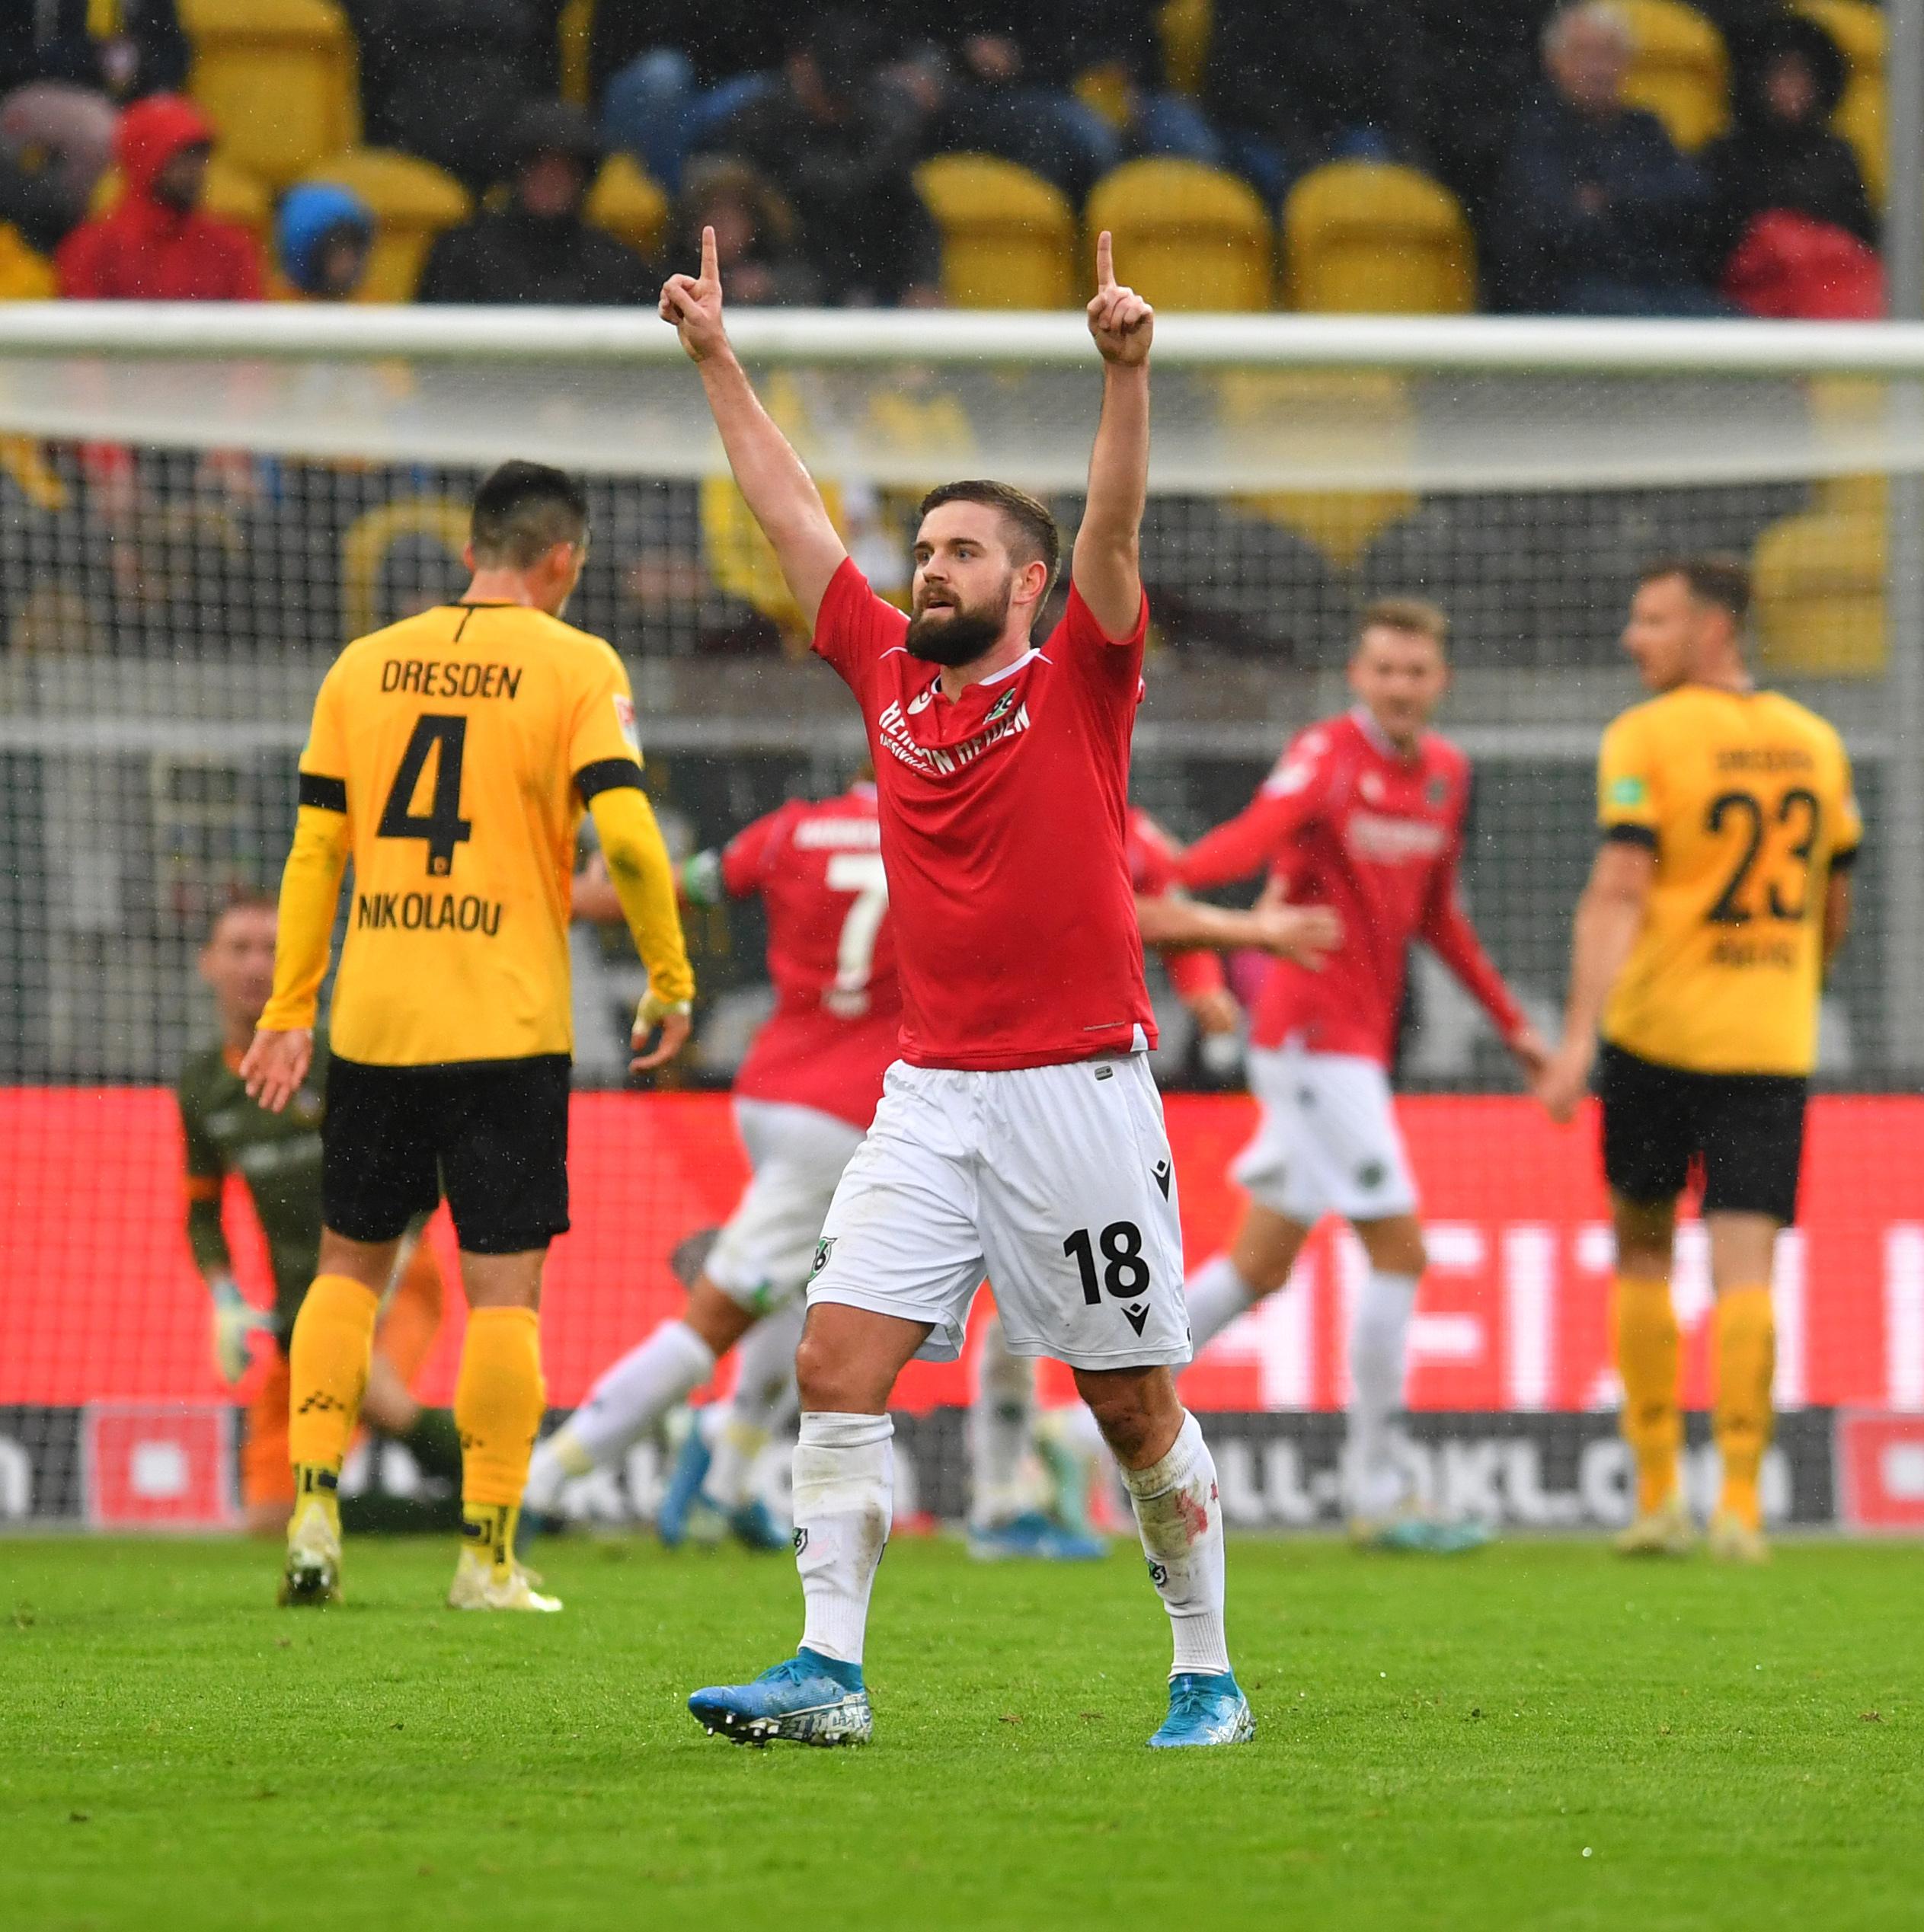 Tor zum 1:0, vorn jubelt Marc Stendera (18, Hannover), 05.10.2019, Fussball, GER, Saison 2019/2020, 2. Bundesliga, 9. Sp